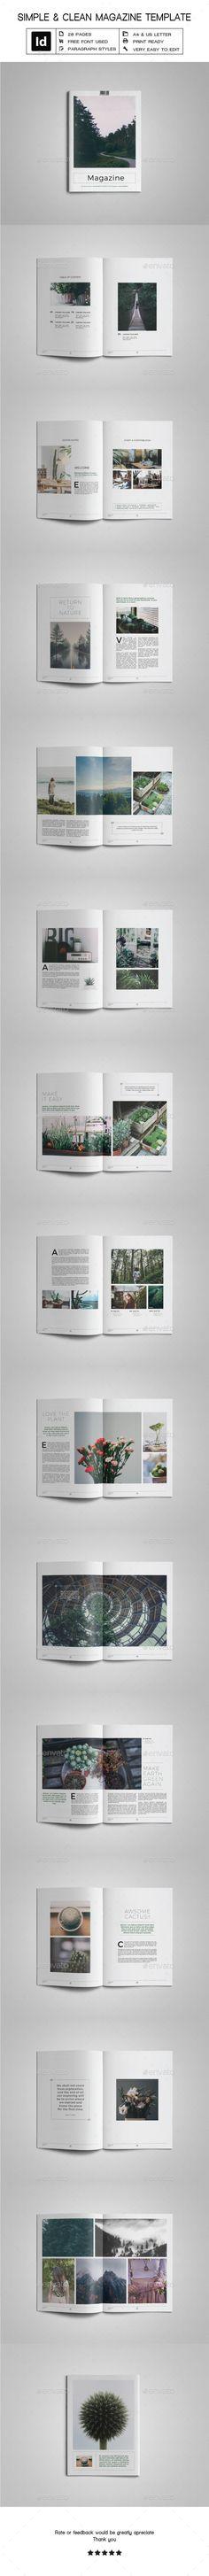 Simple & Clean Magazine Template VI - #Magazines Print #Templates